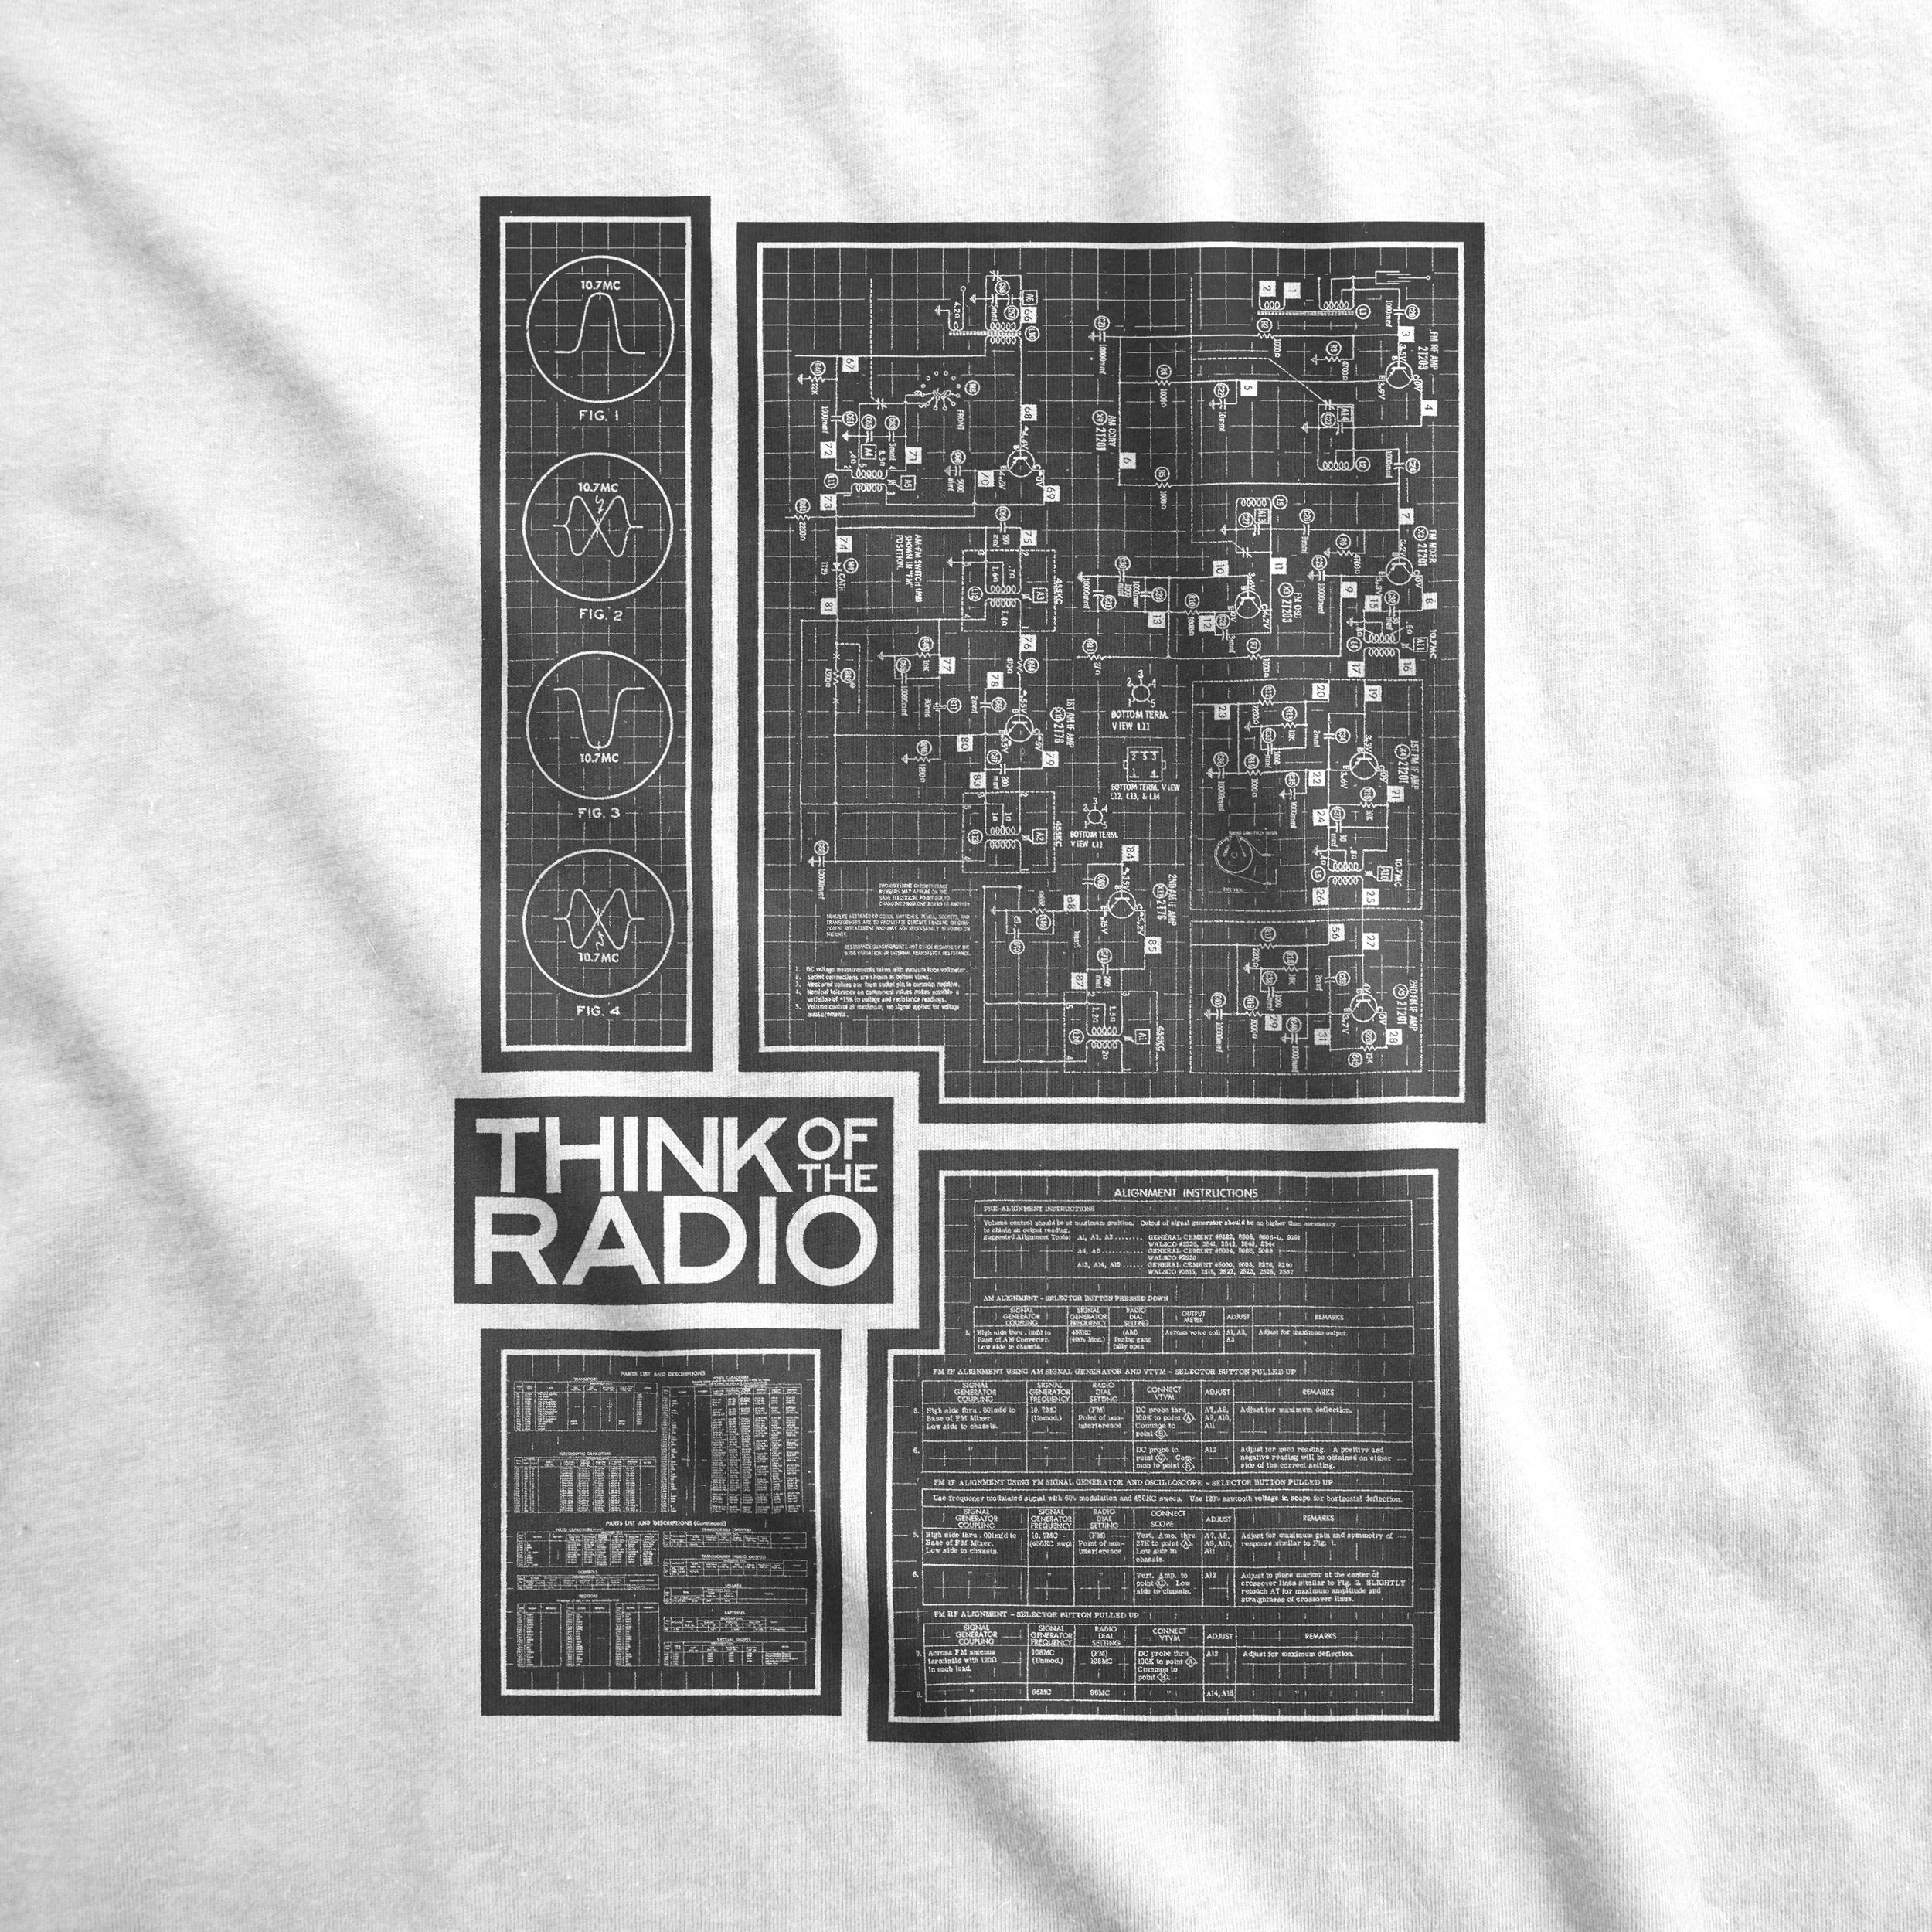 OS02: Think of the Radio